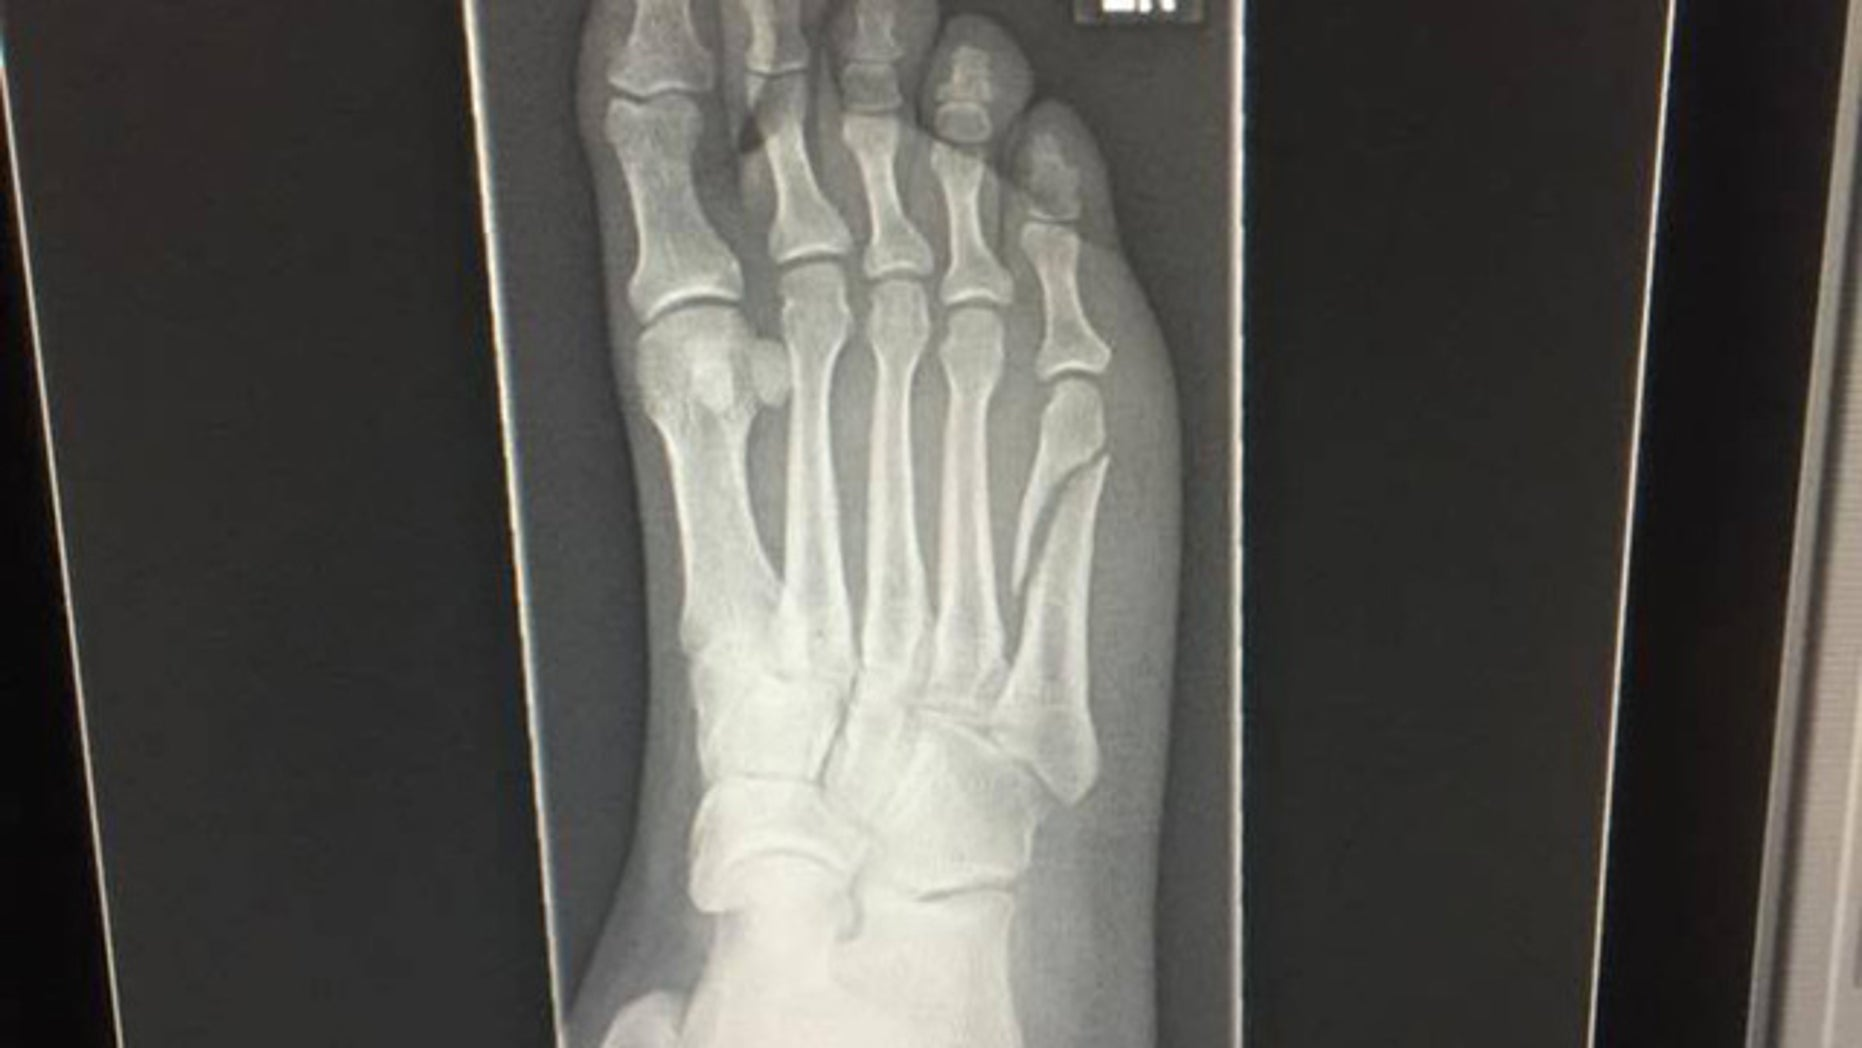 Diana Vadala said she broke her foot while celebrating the Patriots win.